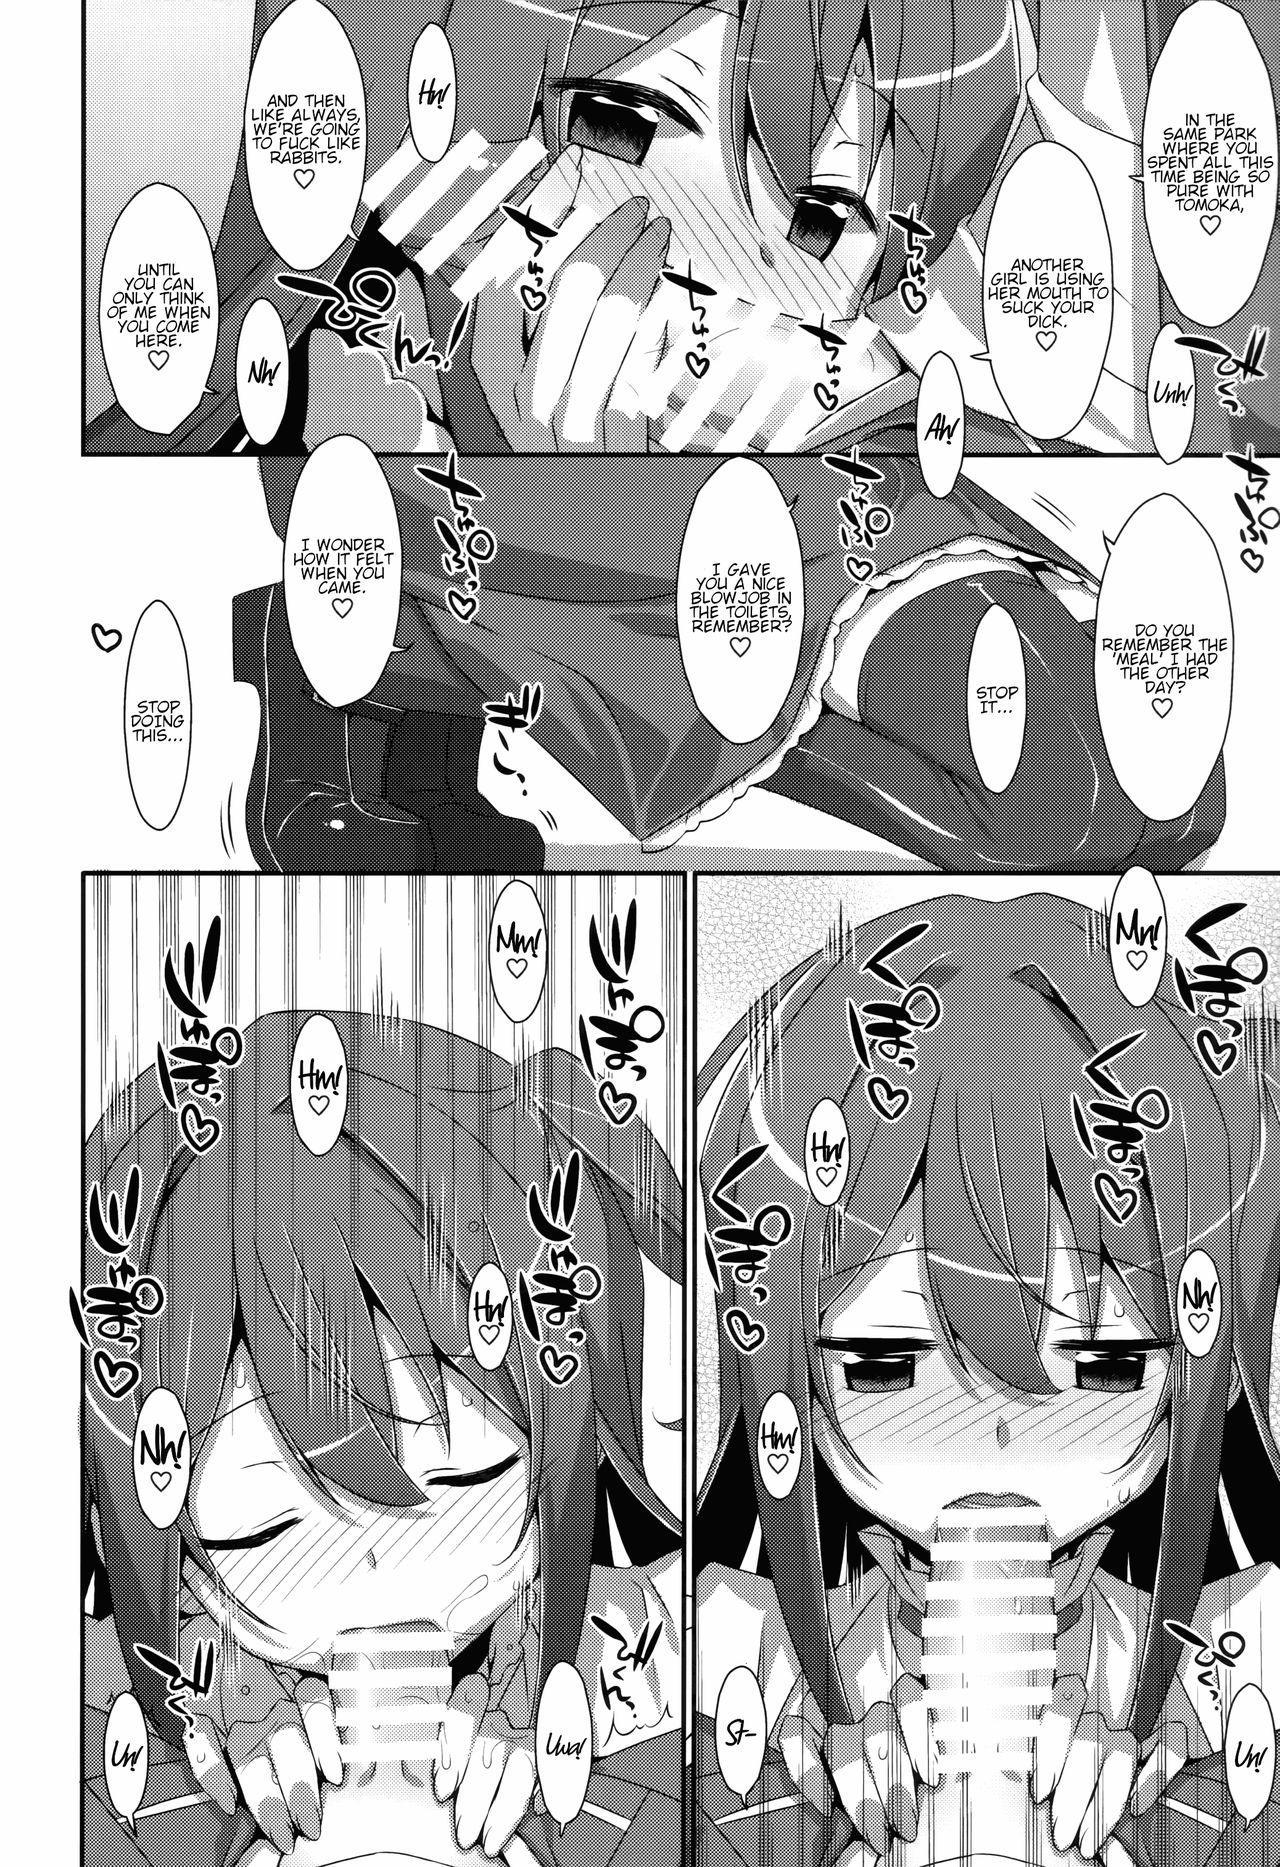 Watashi no, Onii-chan Extra 5